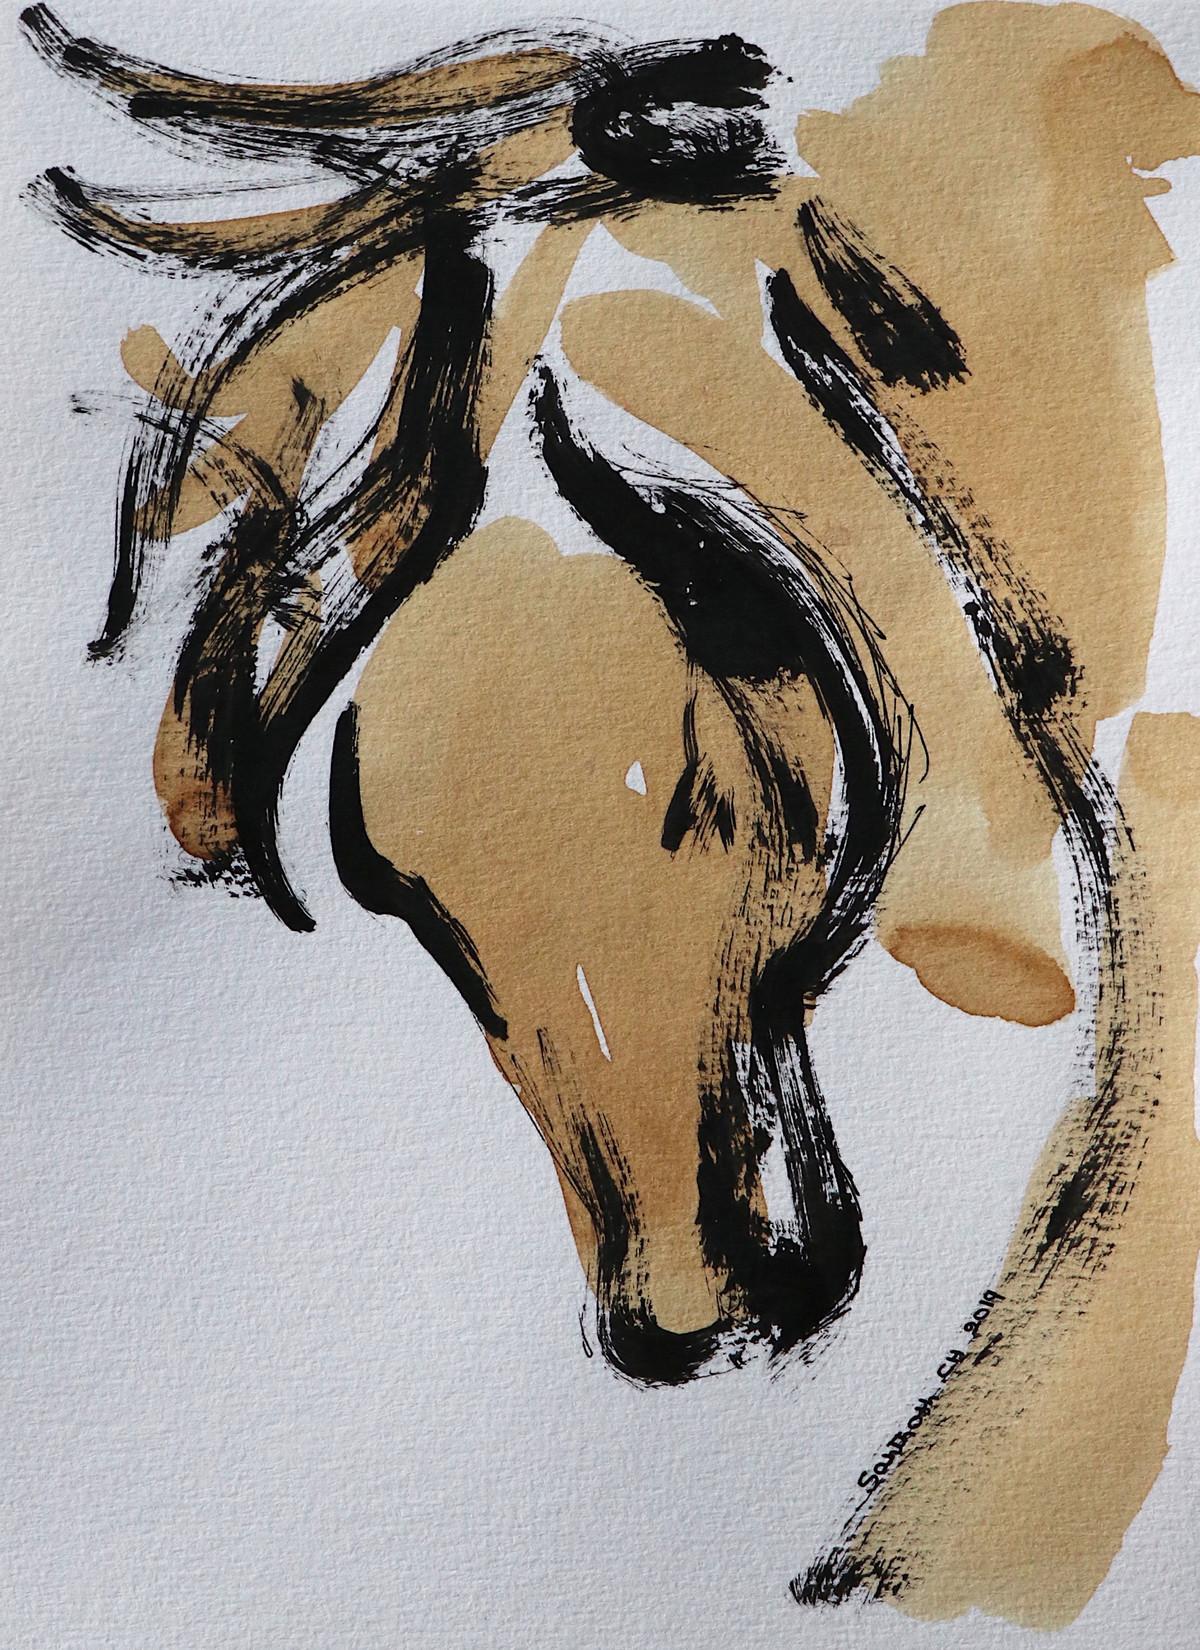 Horse 98 Digital Print by Santhosh CH,Illustration